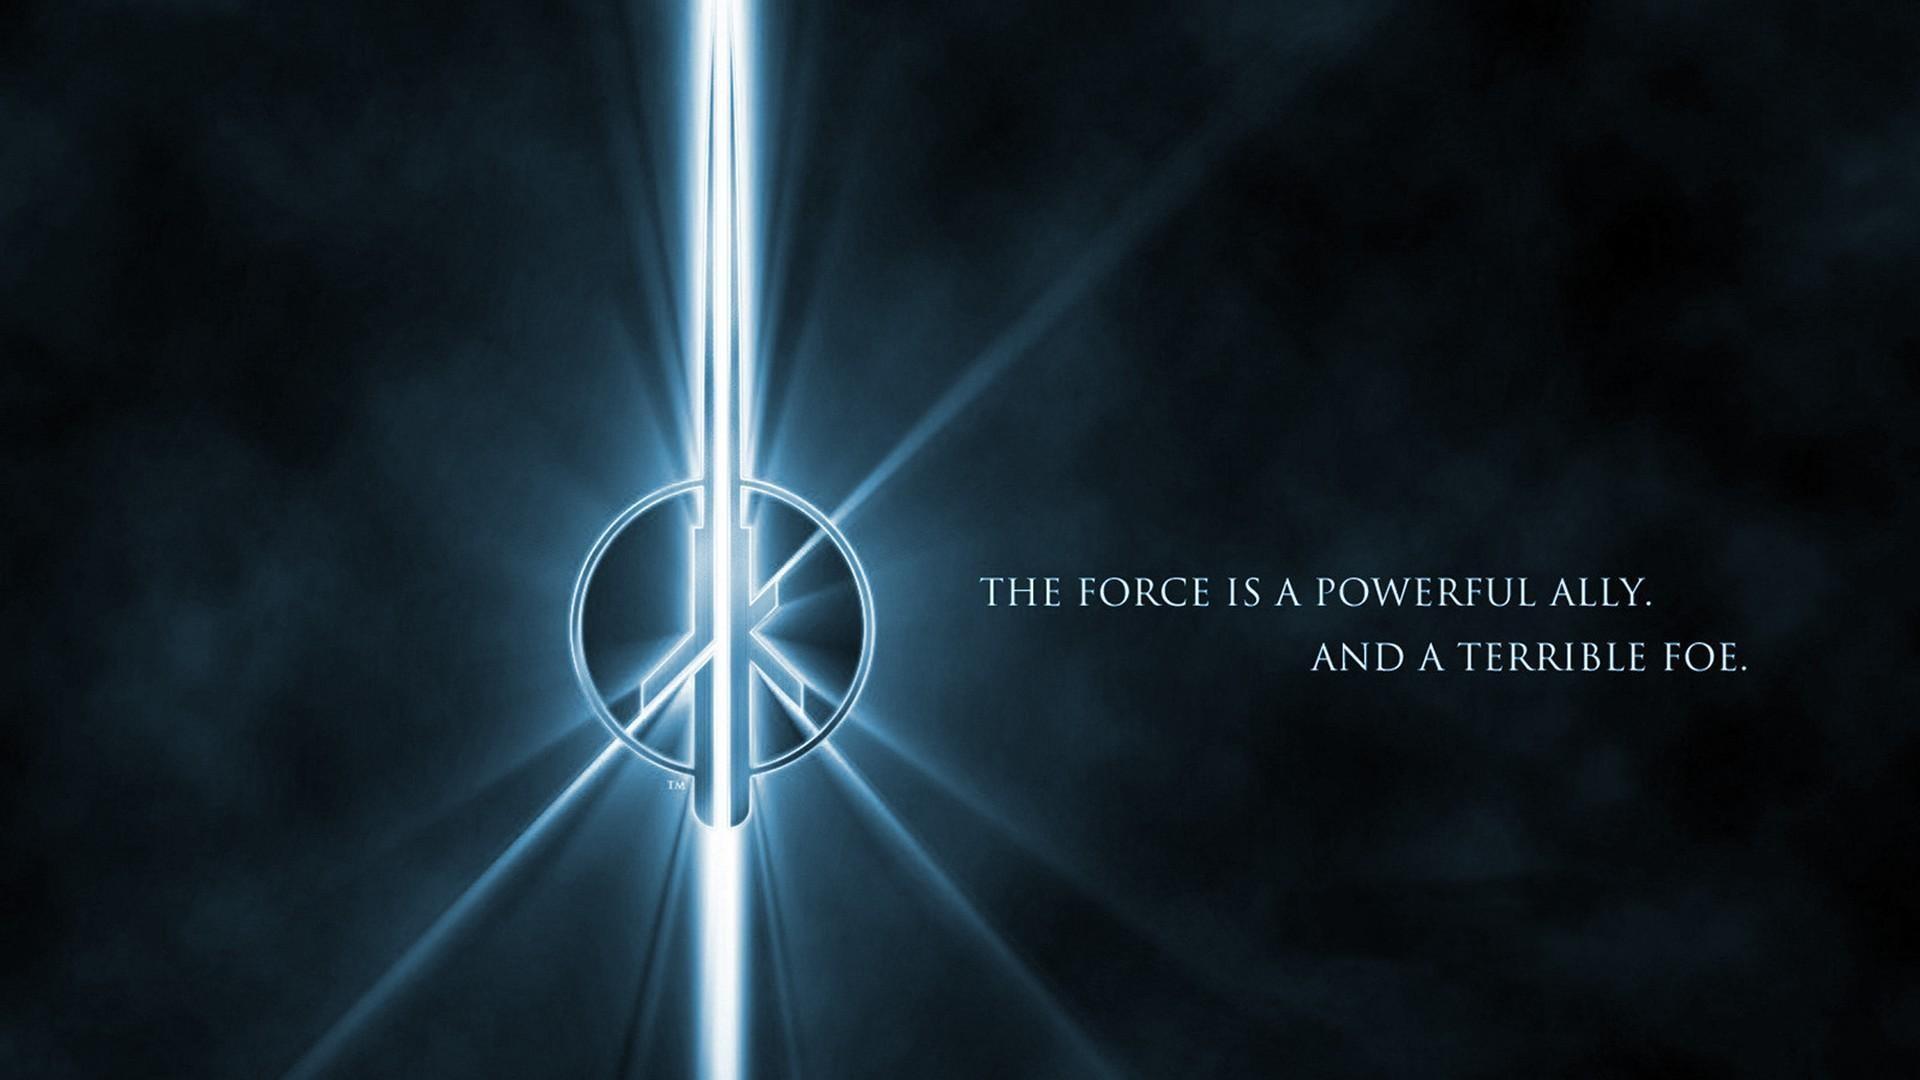 Grey jedi code wallpaper 76 images - Jedi wallpaper ...